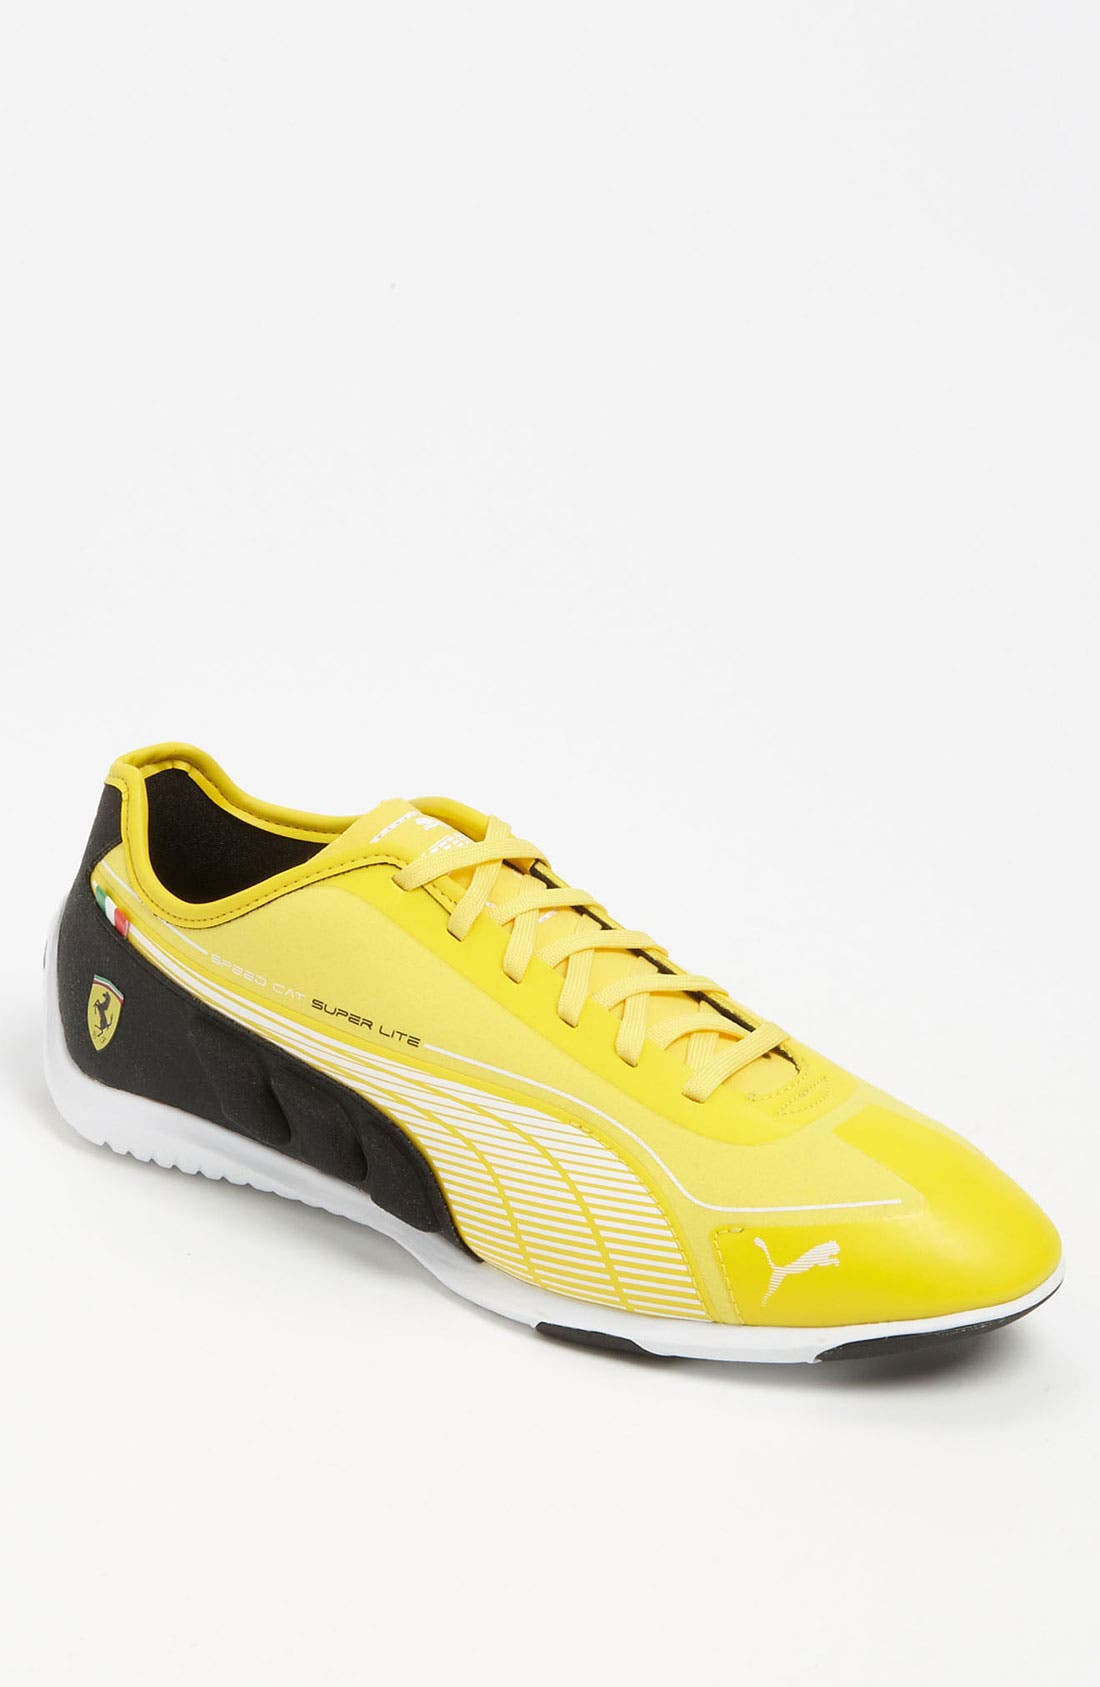 Alternate Image 1 Selected - PUMA 'Ferrari Speed Cat Super Lite' Sneaker (Men)